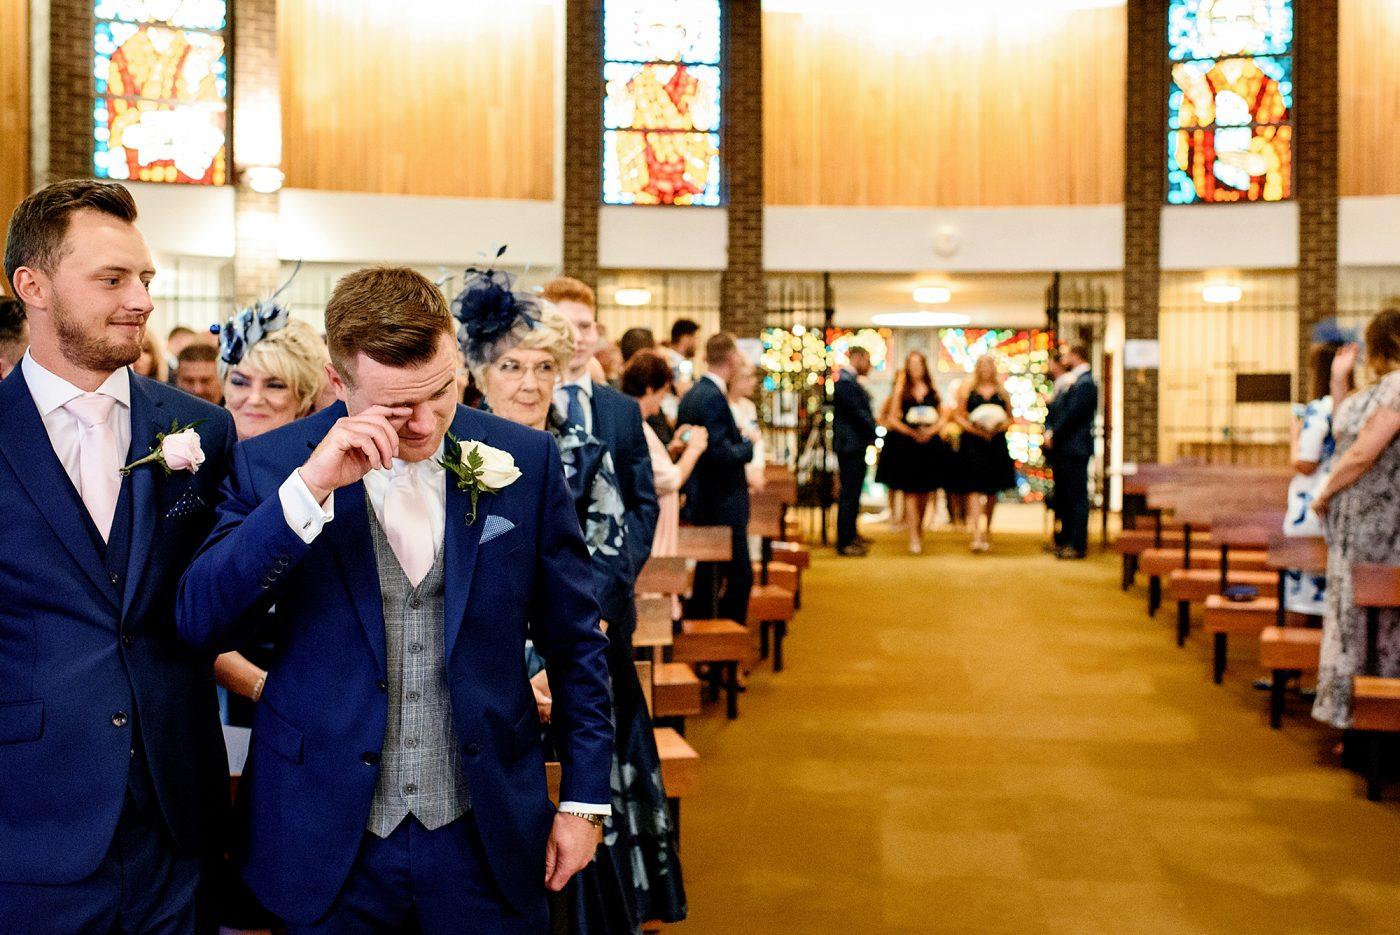 getting getting emotional before wedding ceremony